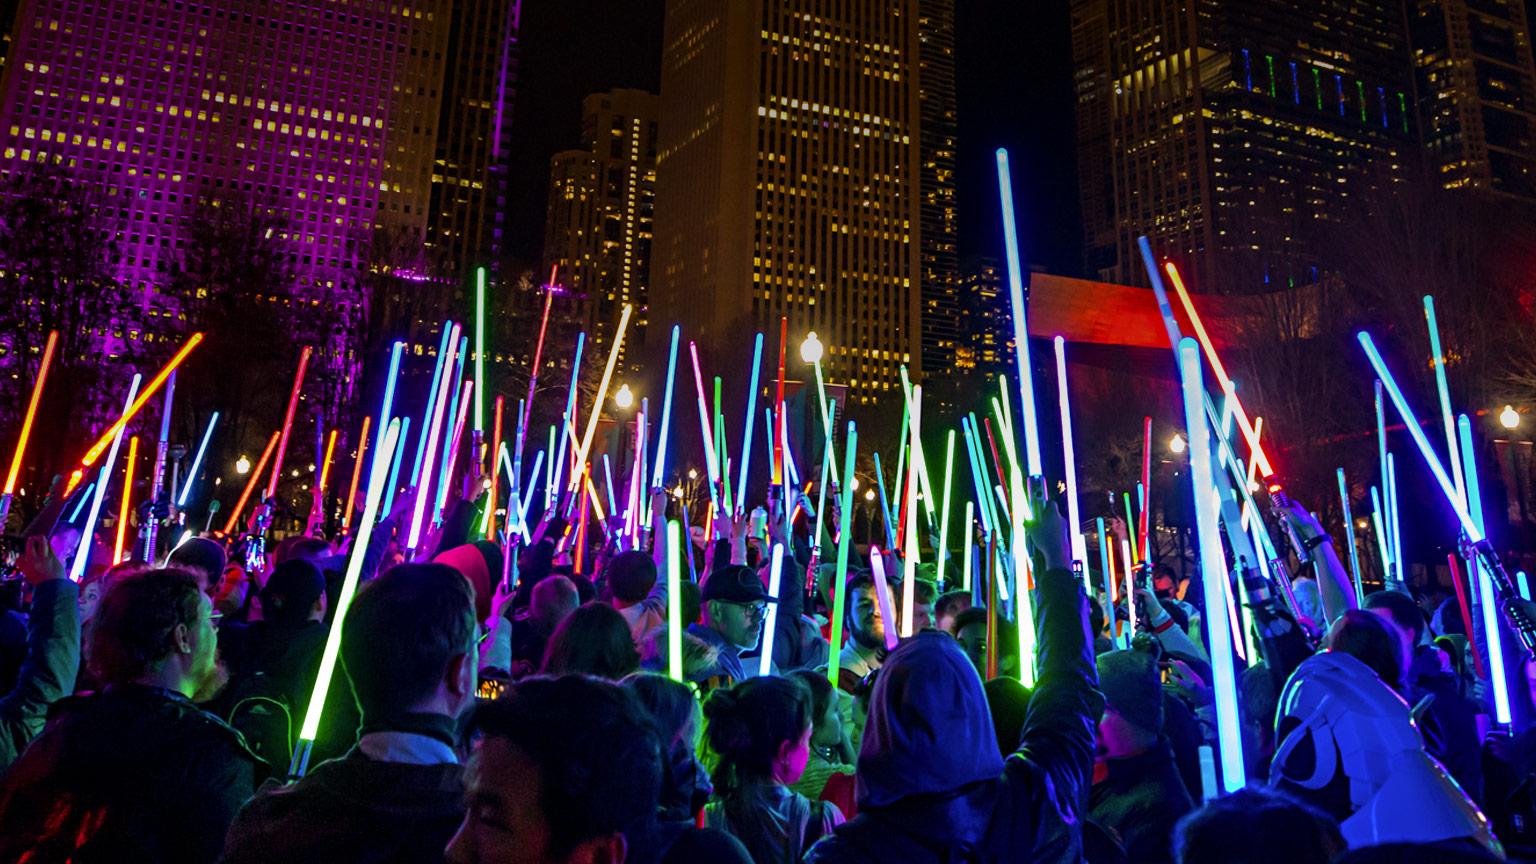 Star Wars Celebration: annunciate le date per il 2020 ad Anaheim thumbnail